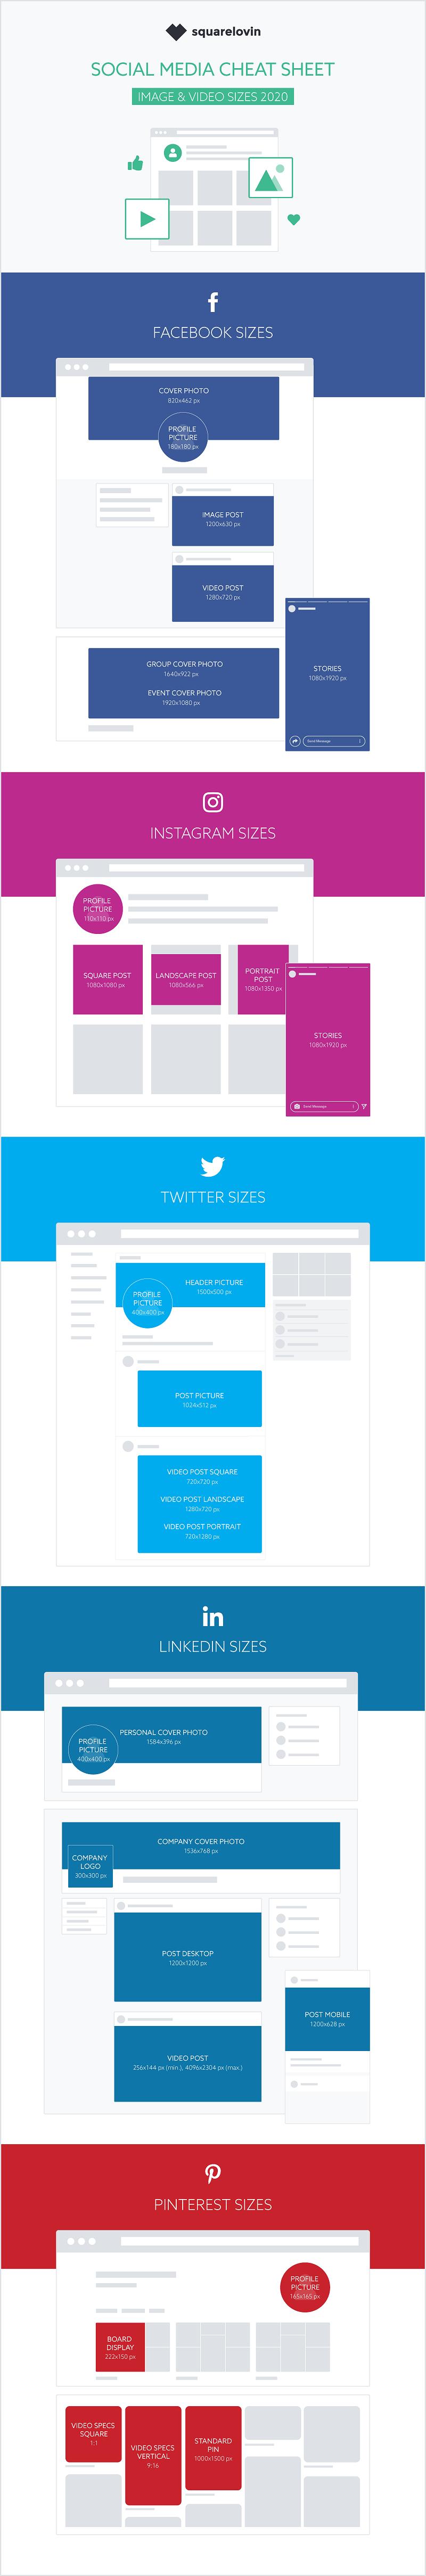 social media image sizes chart